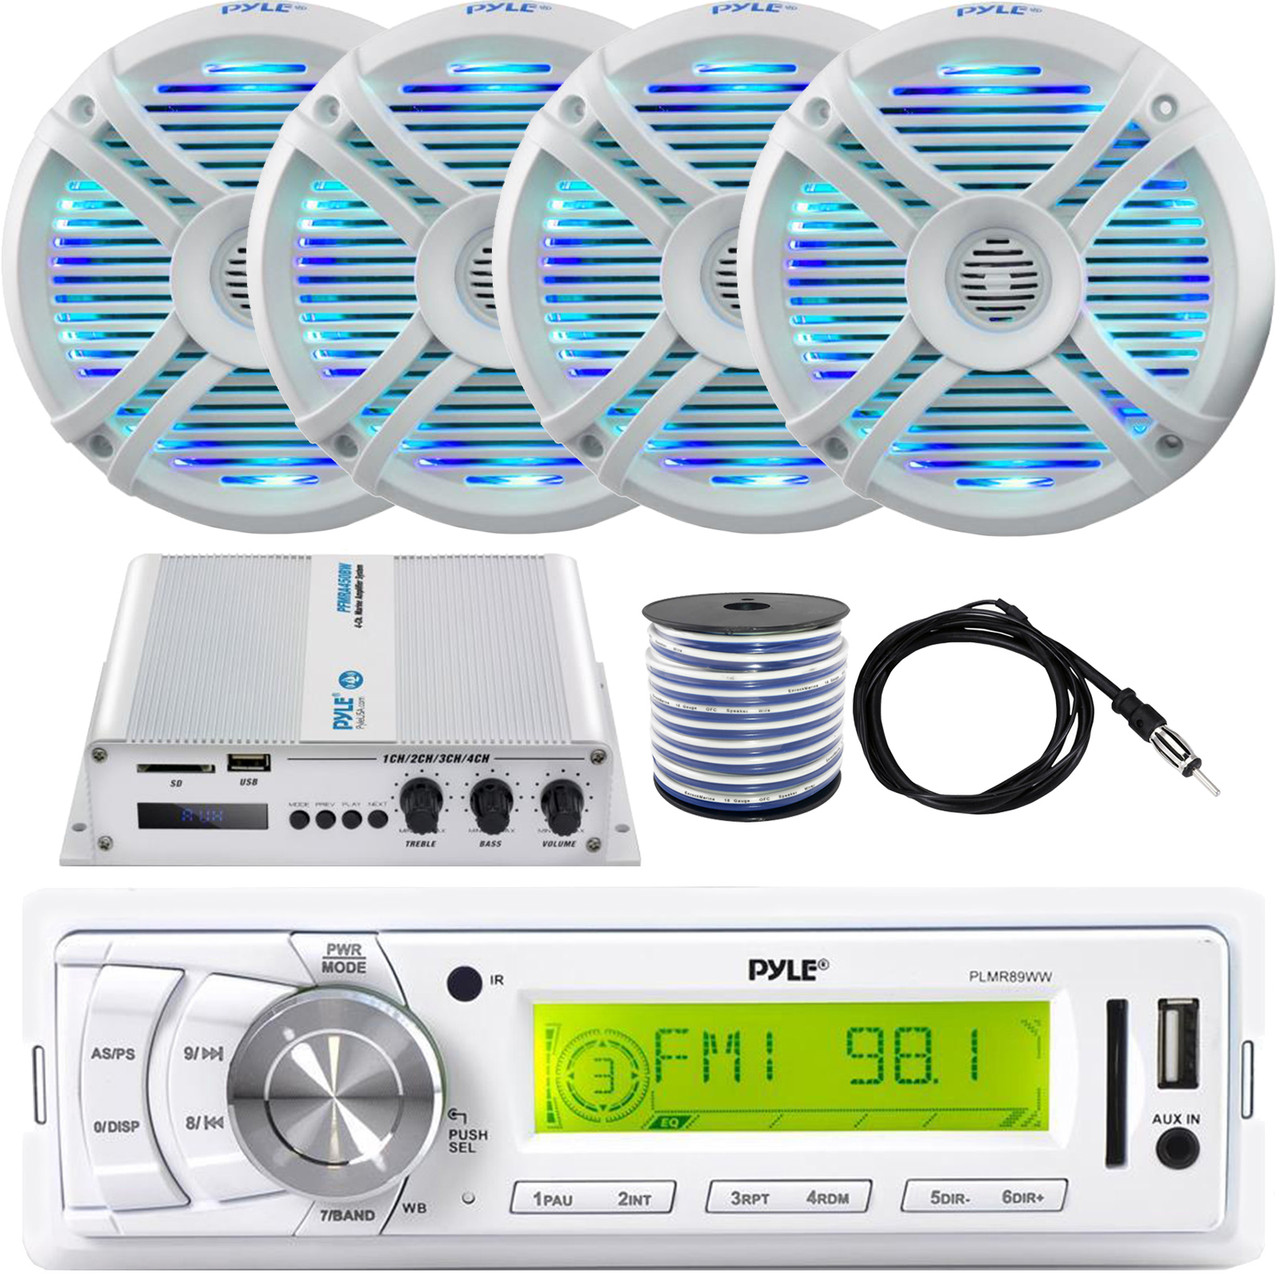 "6.5/"" Dual Waterproof Marine Speakers LED Light Mount Kit Speaker Wire Grill Pyle PLMRX68LEW 250W Outdoor Car//Boat Stereo Speakers Waterproof//Weather Proof Marine Stereo Speakers System Pair"